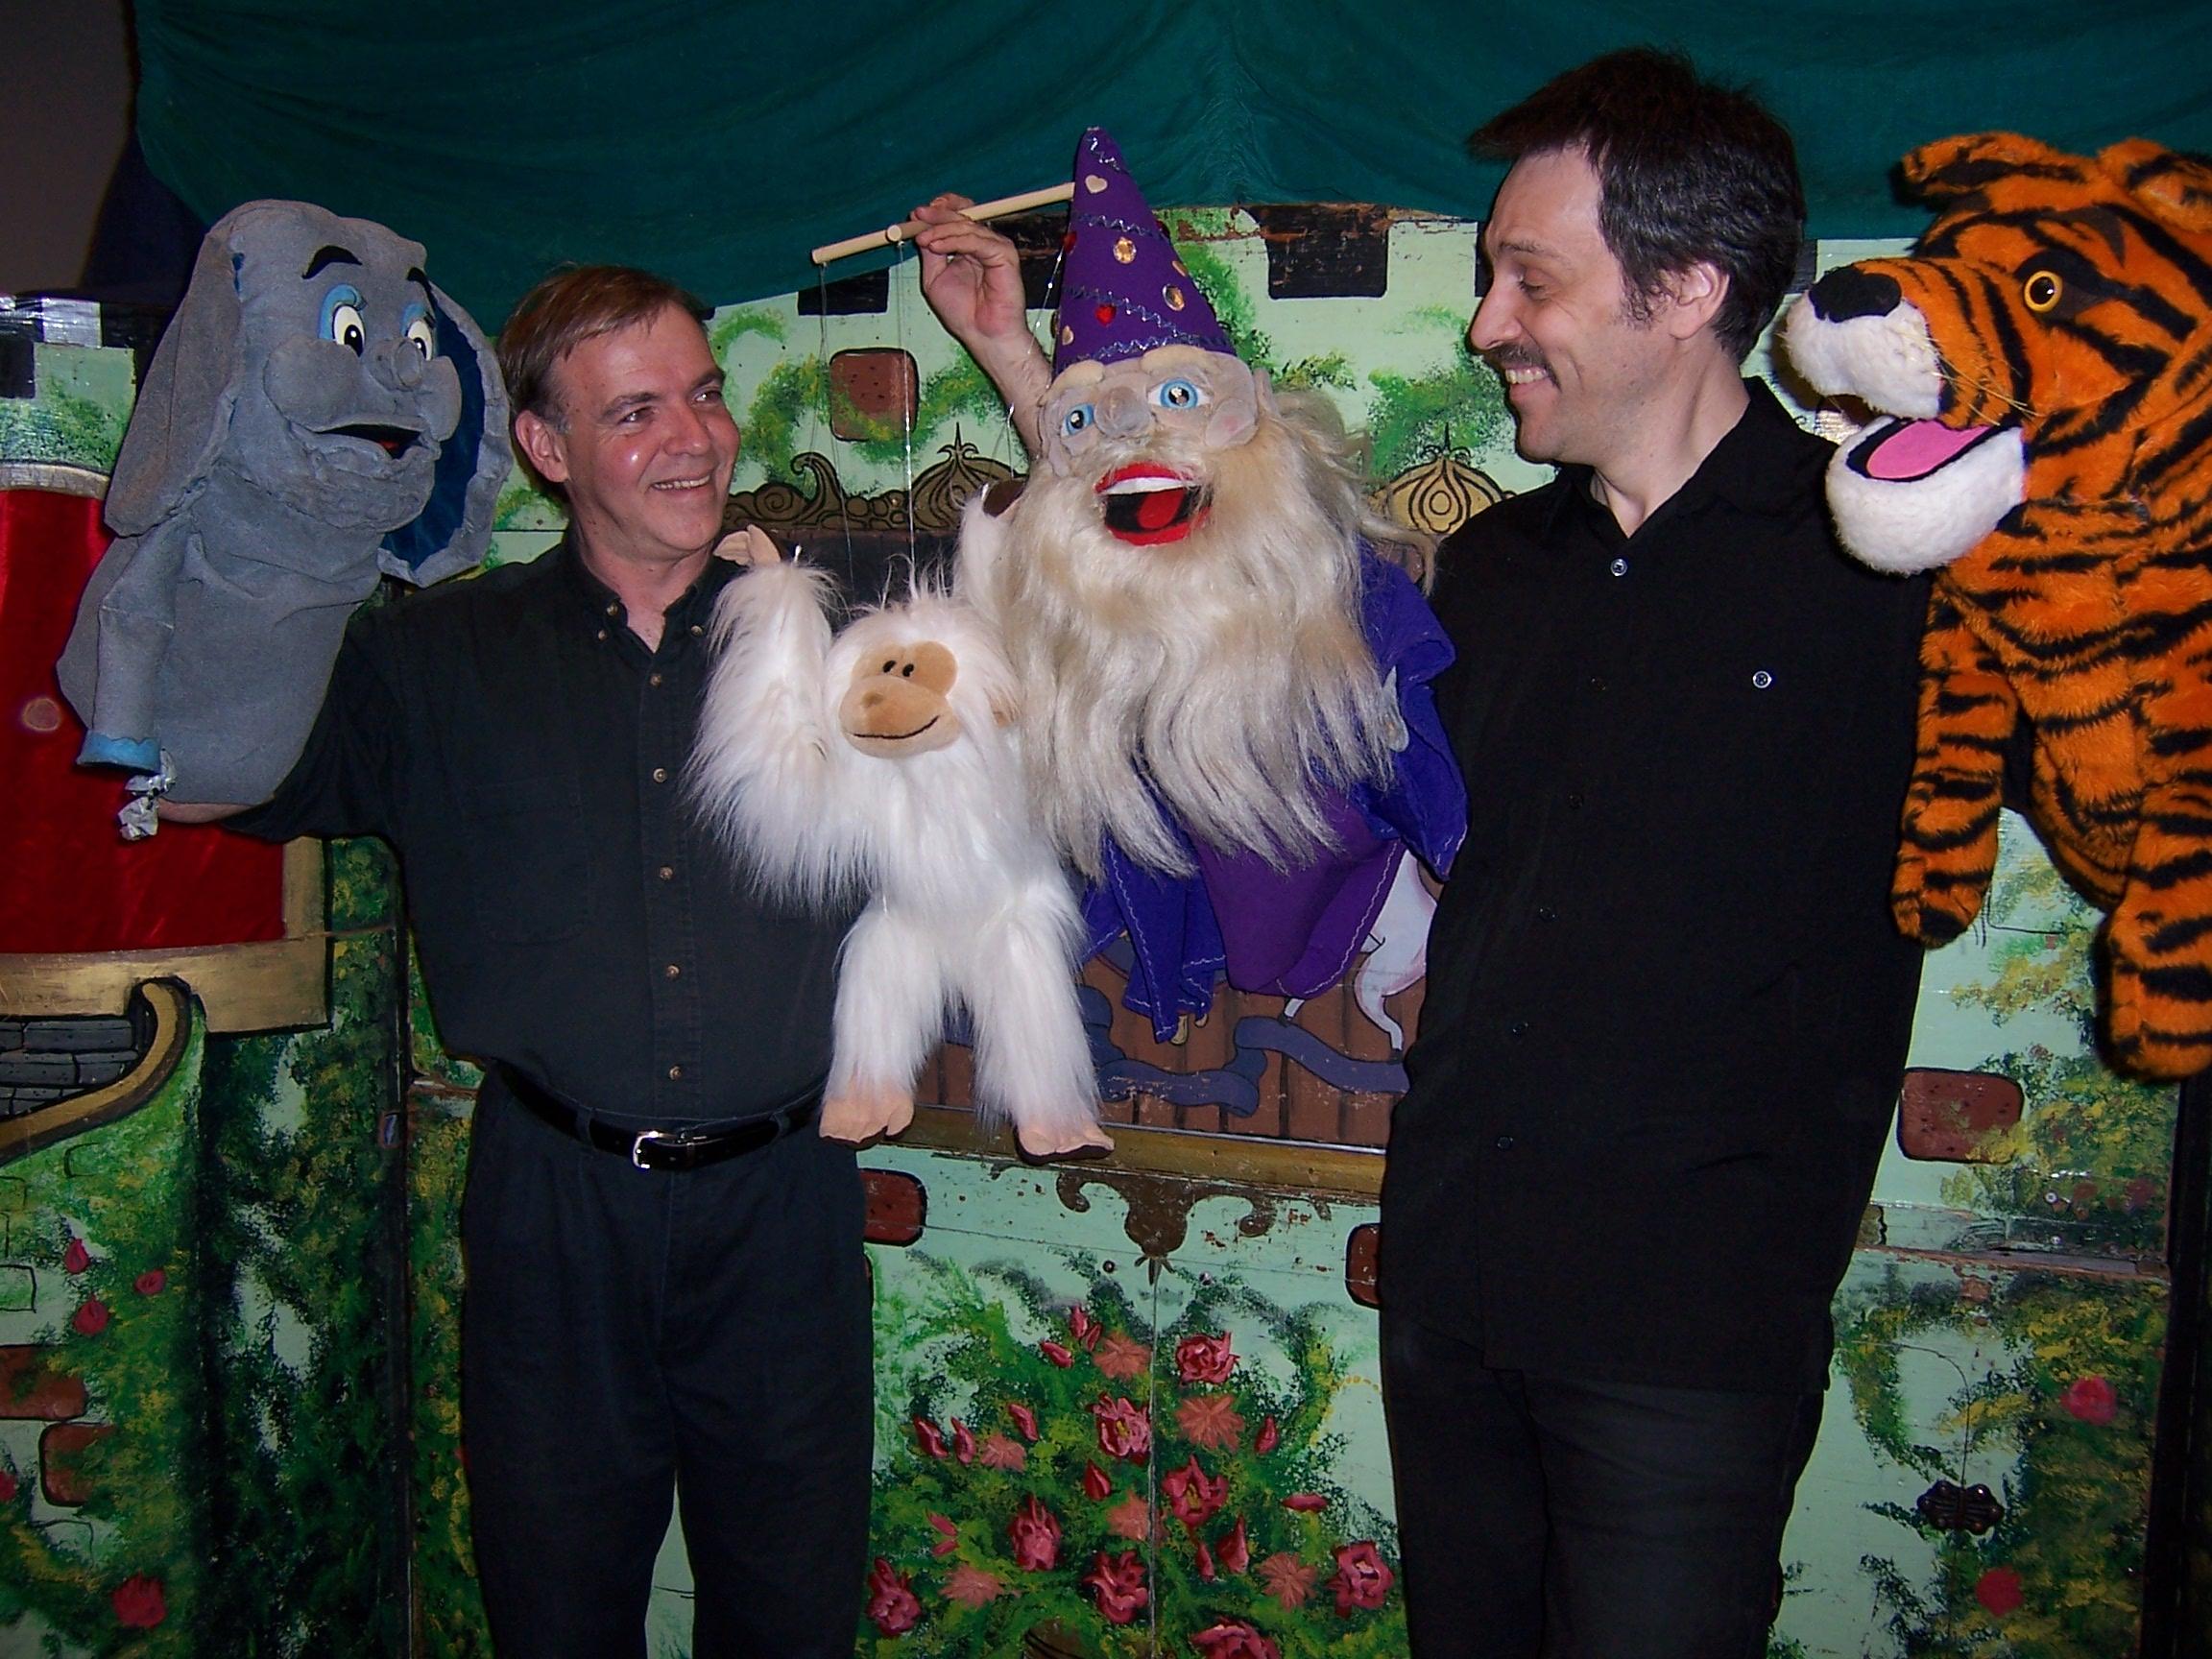 Vermont Puppet theatre educates children about autism awareness